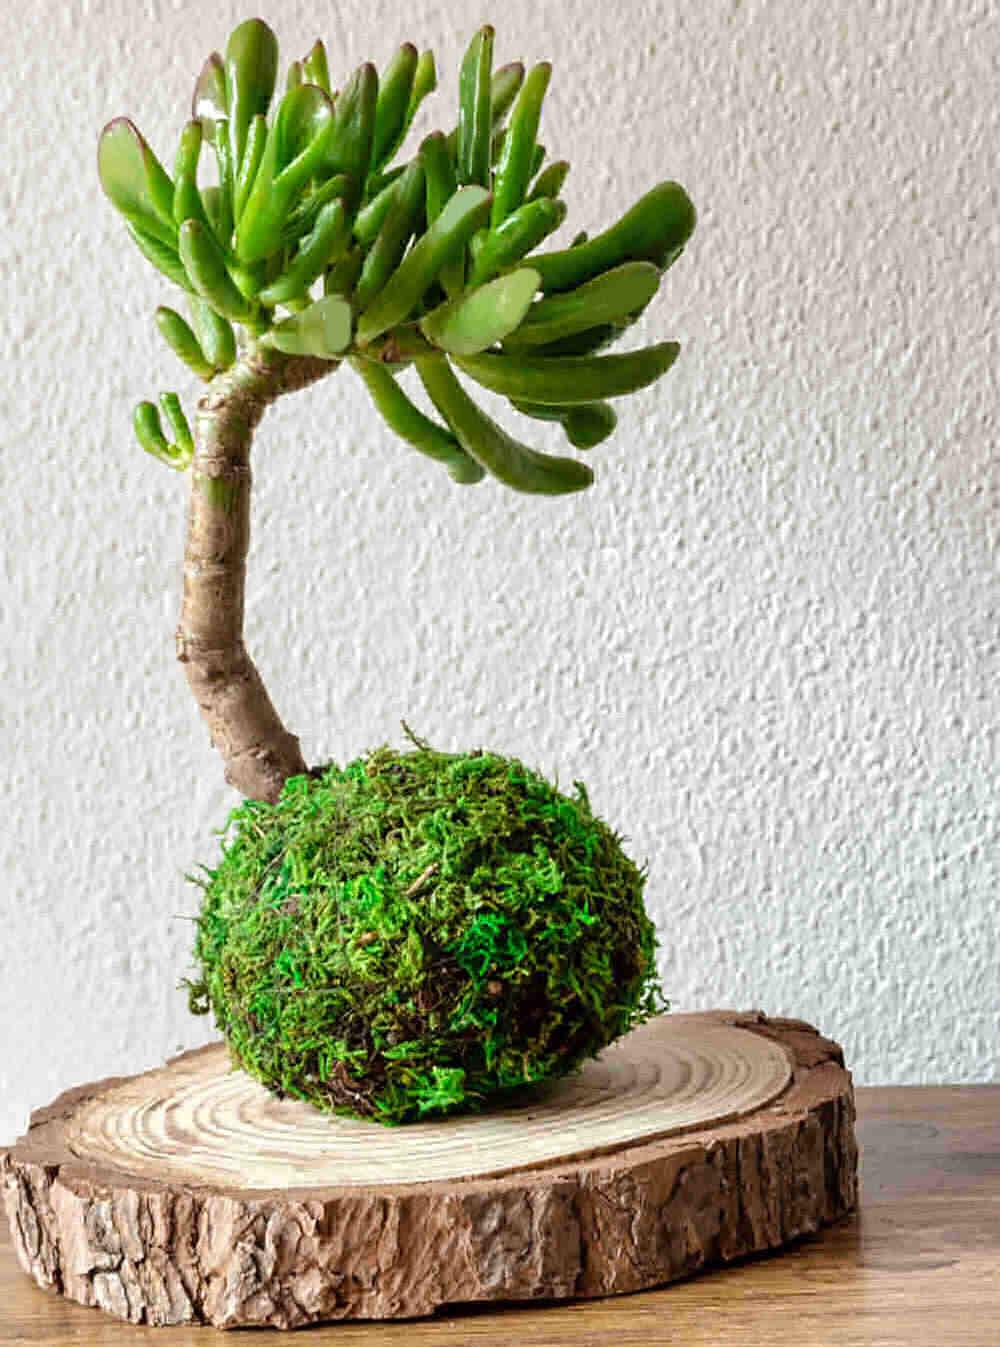 Crassula ovata hobbit formed into a bonsai tree on a wooden log cut.